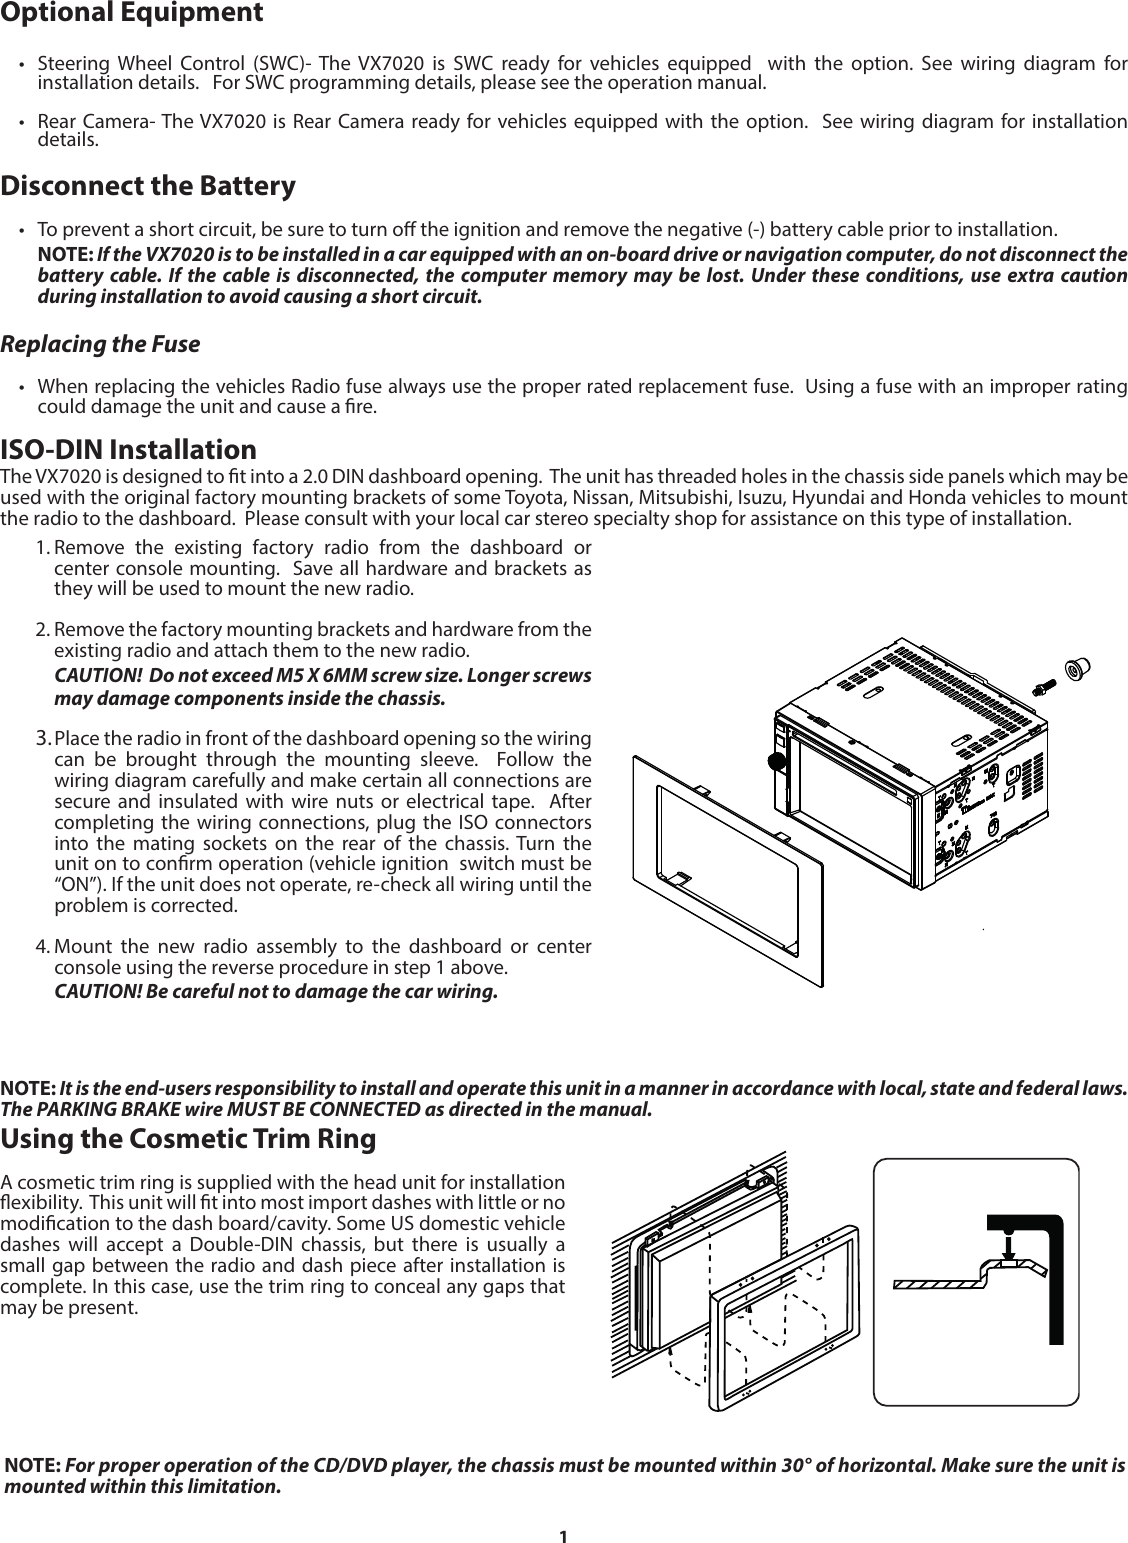 hight resolution of  audiovox vx7020 installation manual 128 9293 guide 03 25 14 on prestige remote car starter diagram